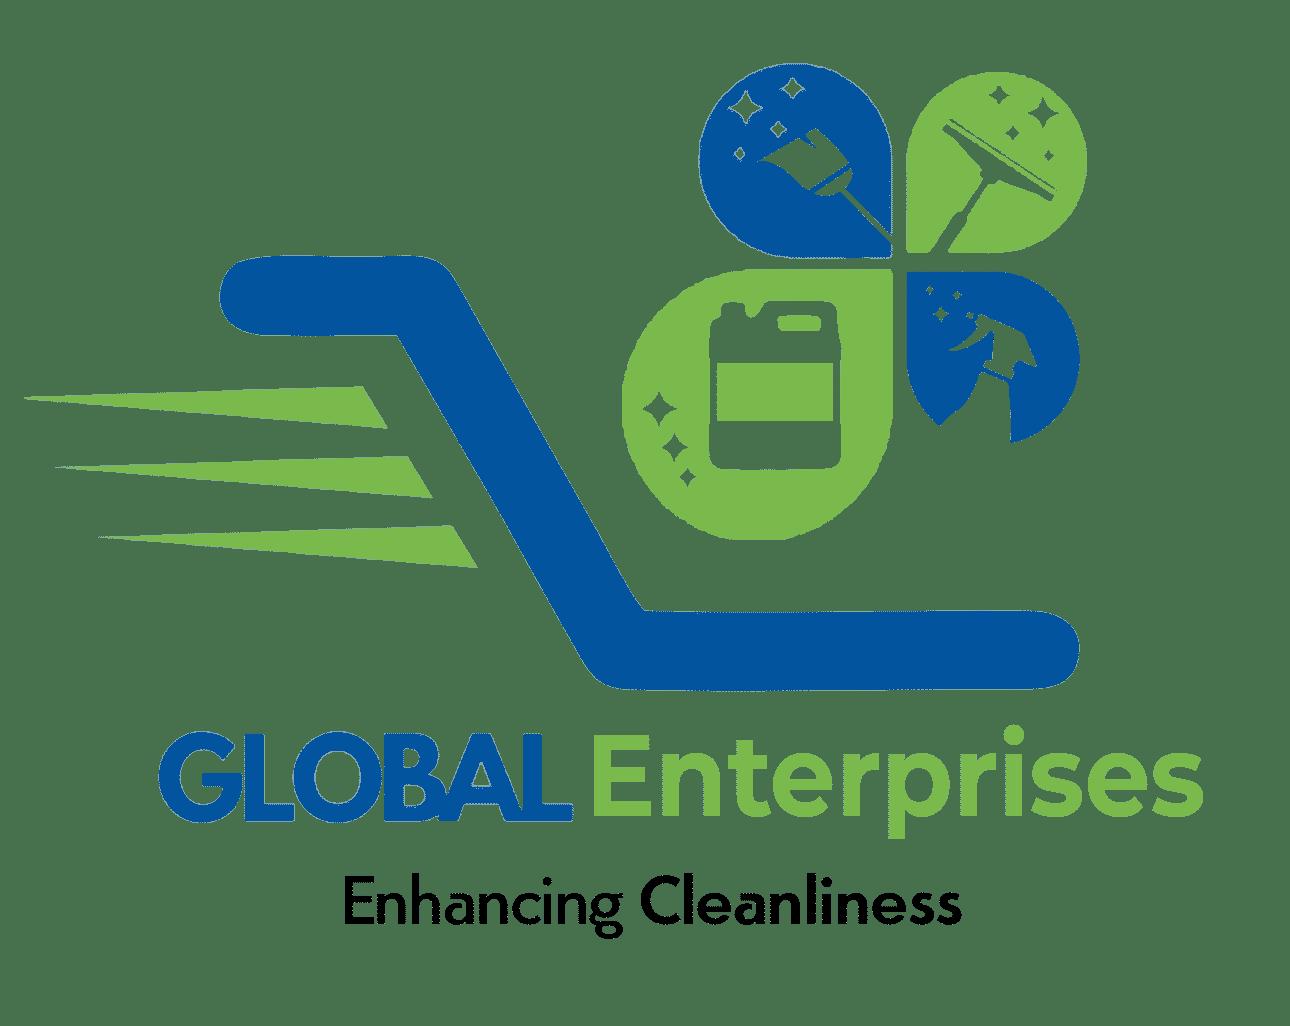 Global-Enterprises-Enhancing-Cleanliness